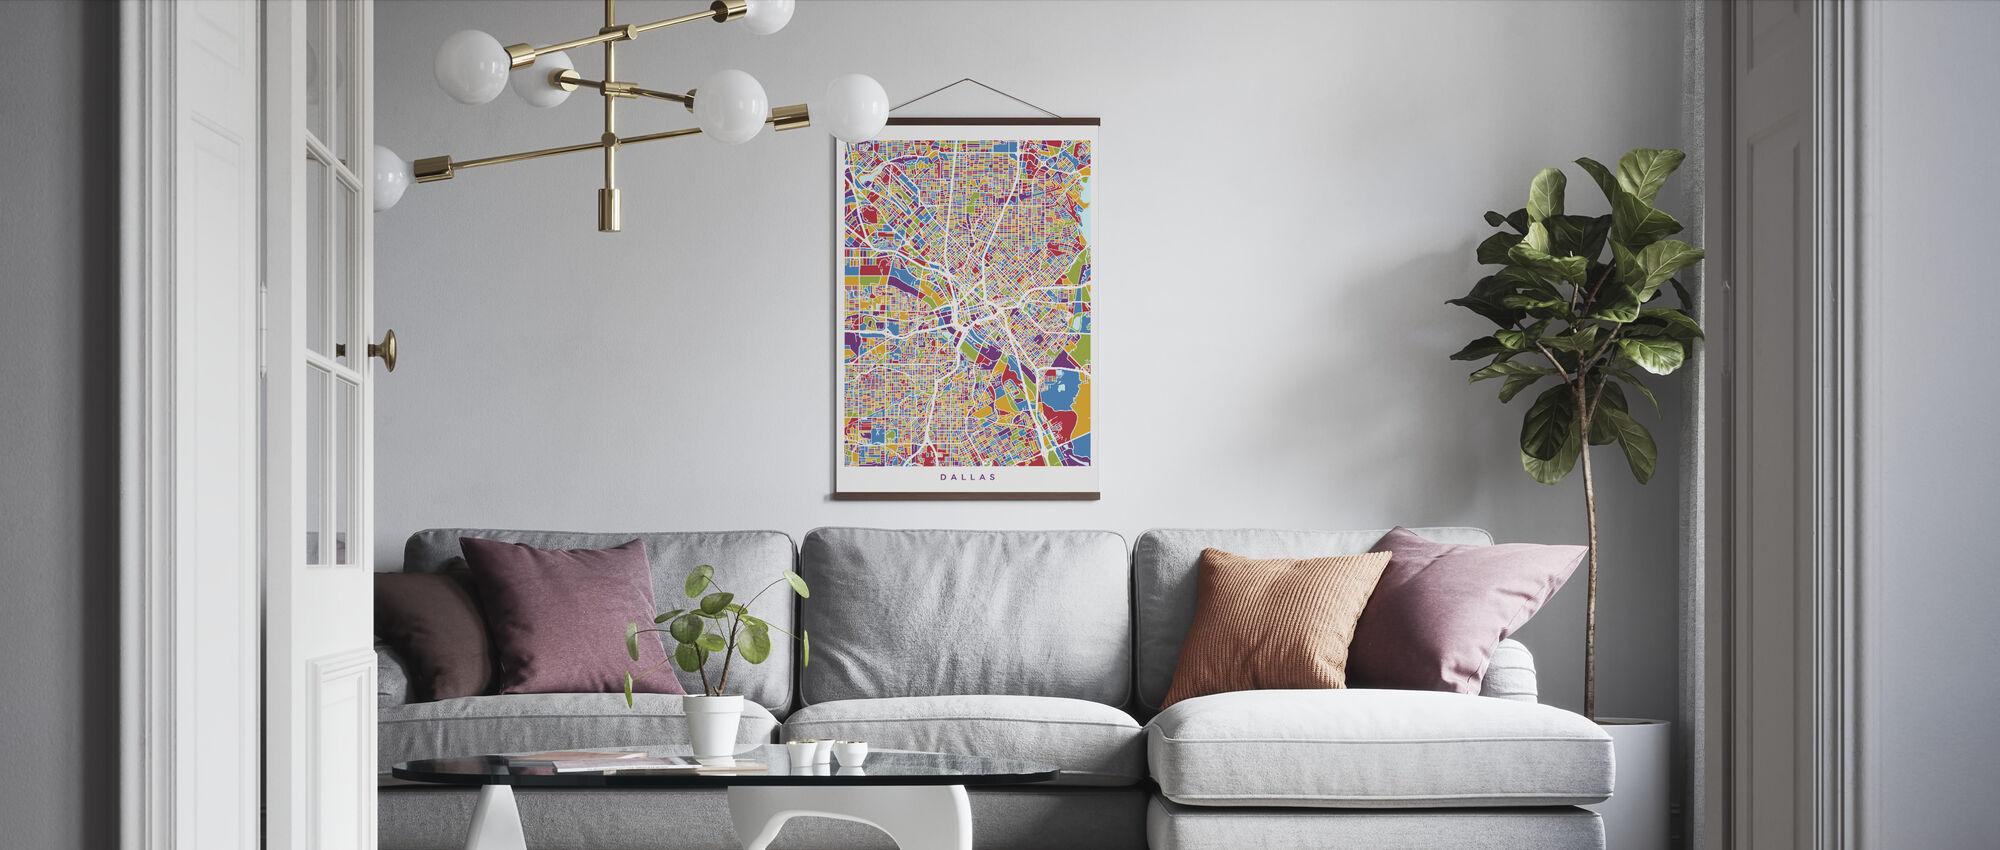 Dallas Texas City Map - Poster - Living Room